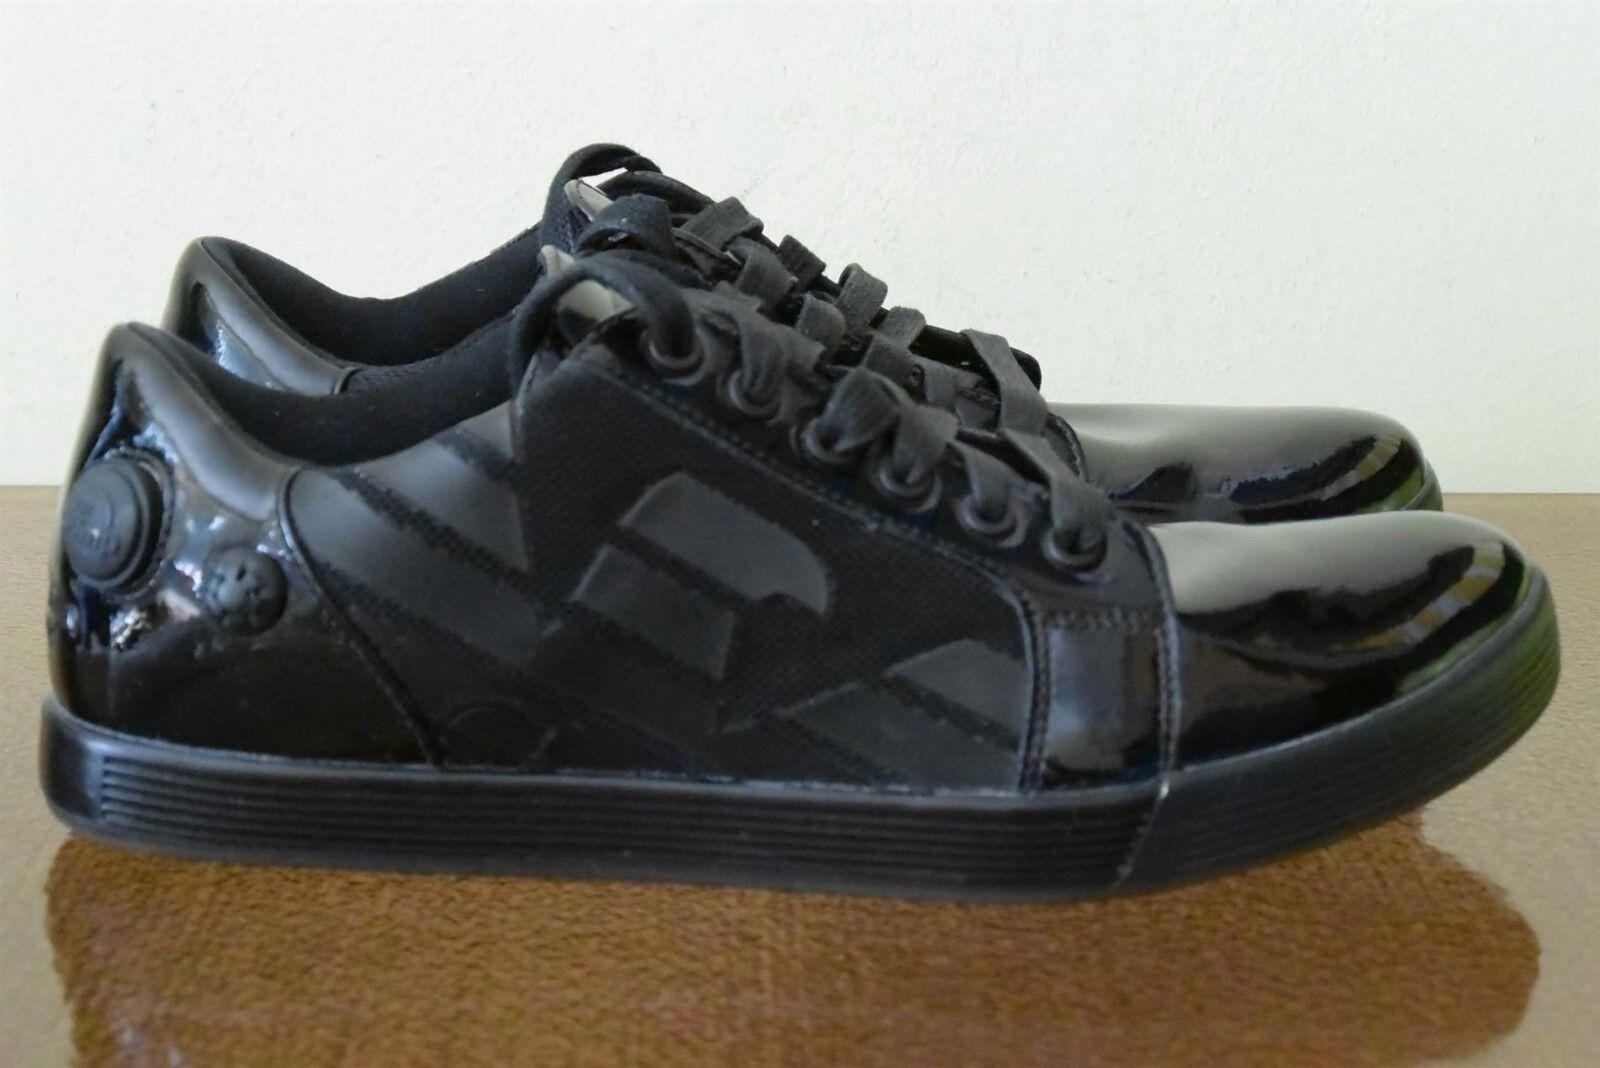 Reebok x Emporio Armani The Pump Vintage Black Sneakers Limited Sz 8.5